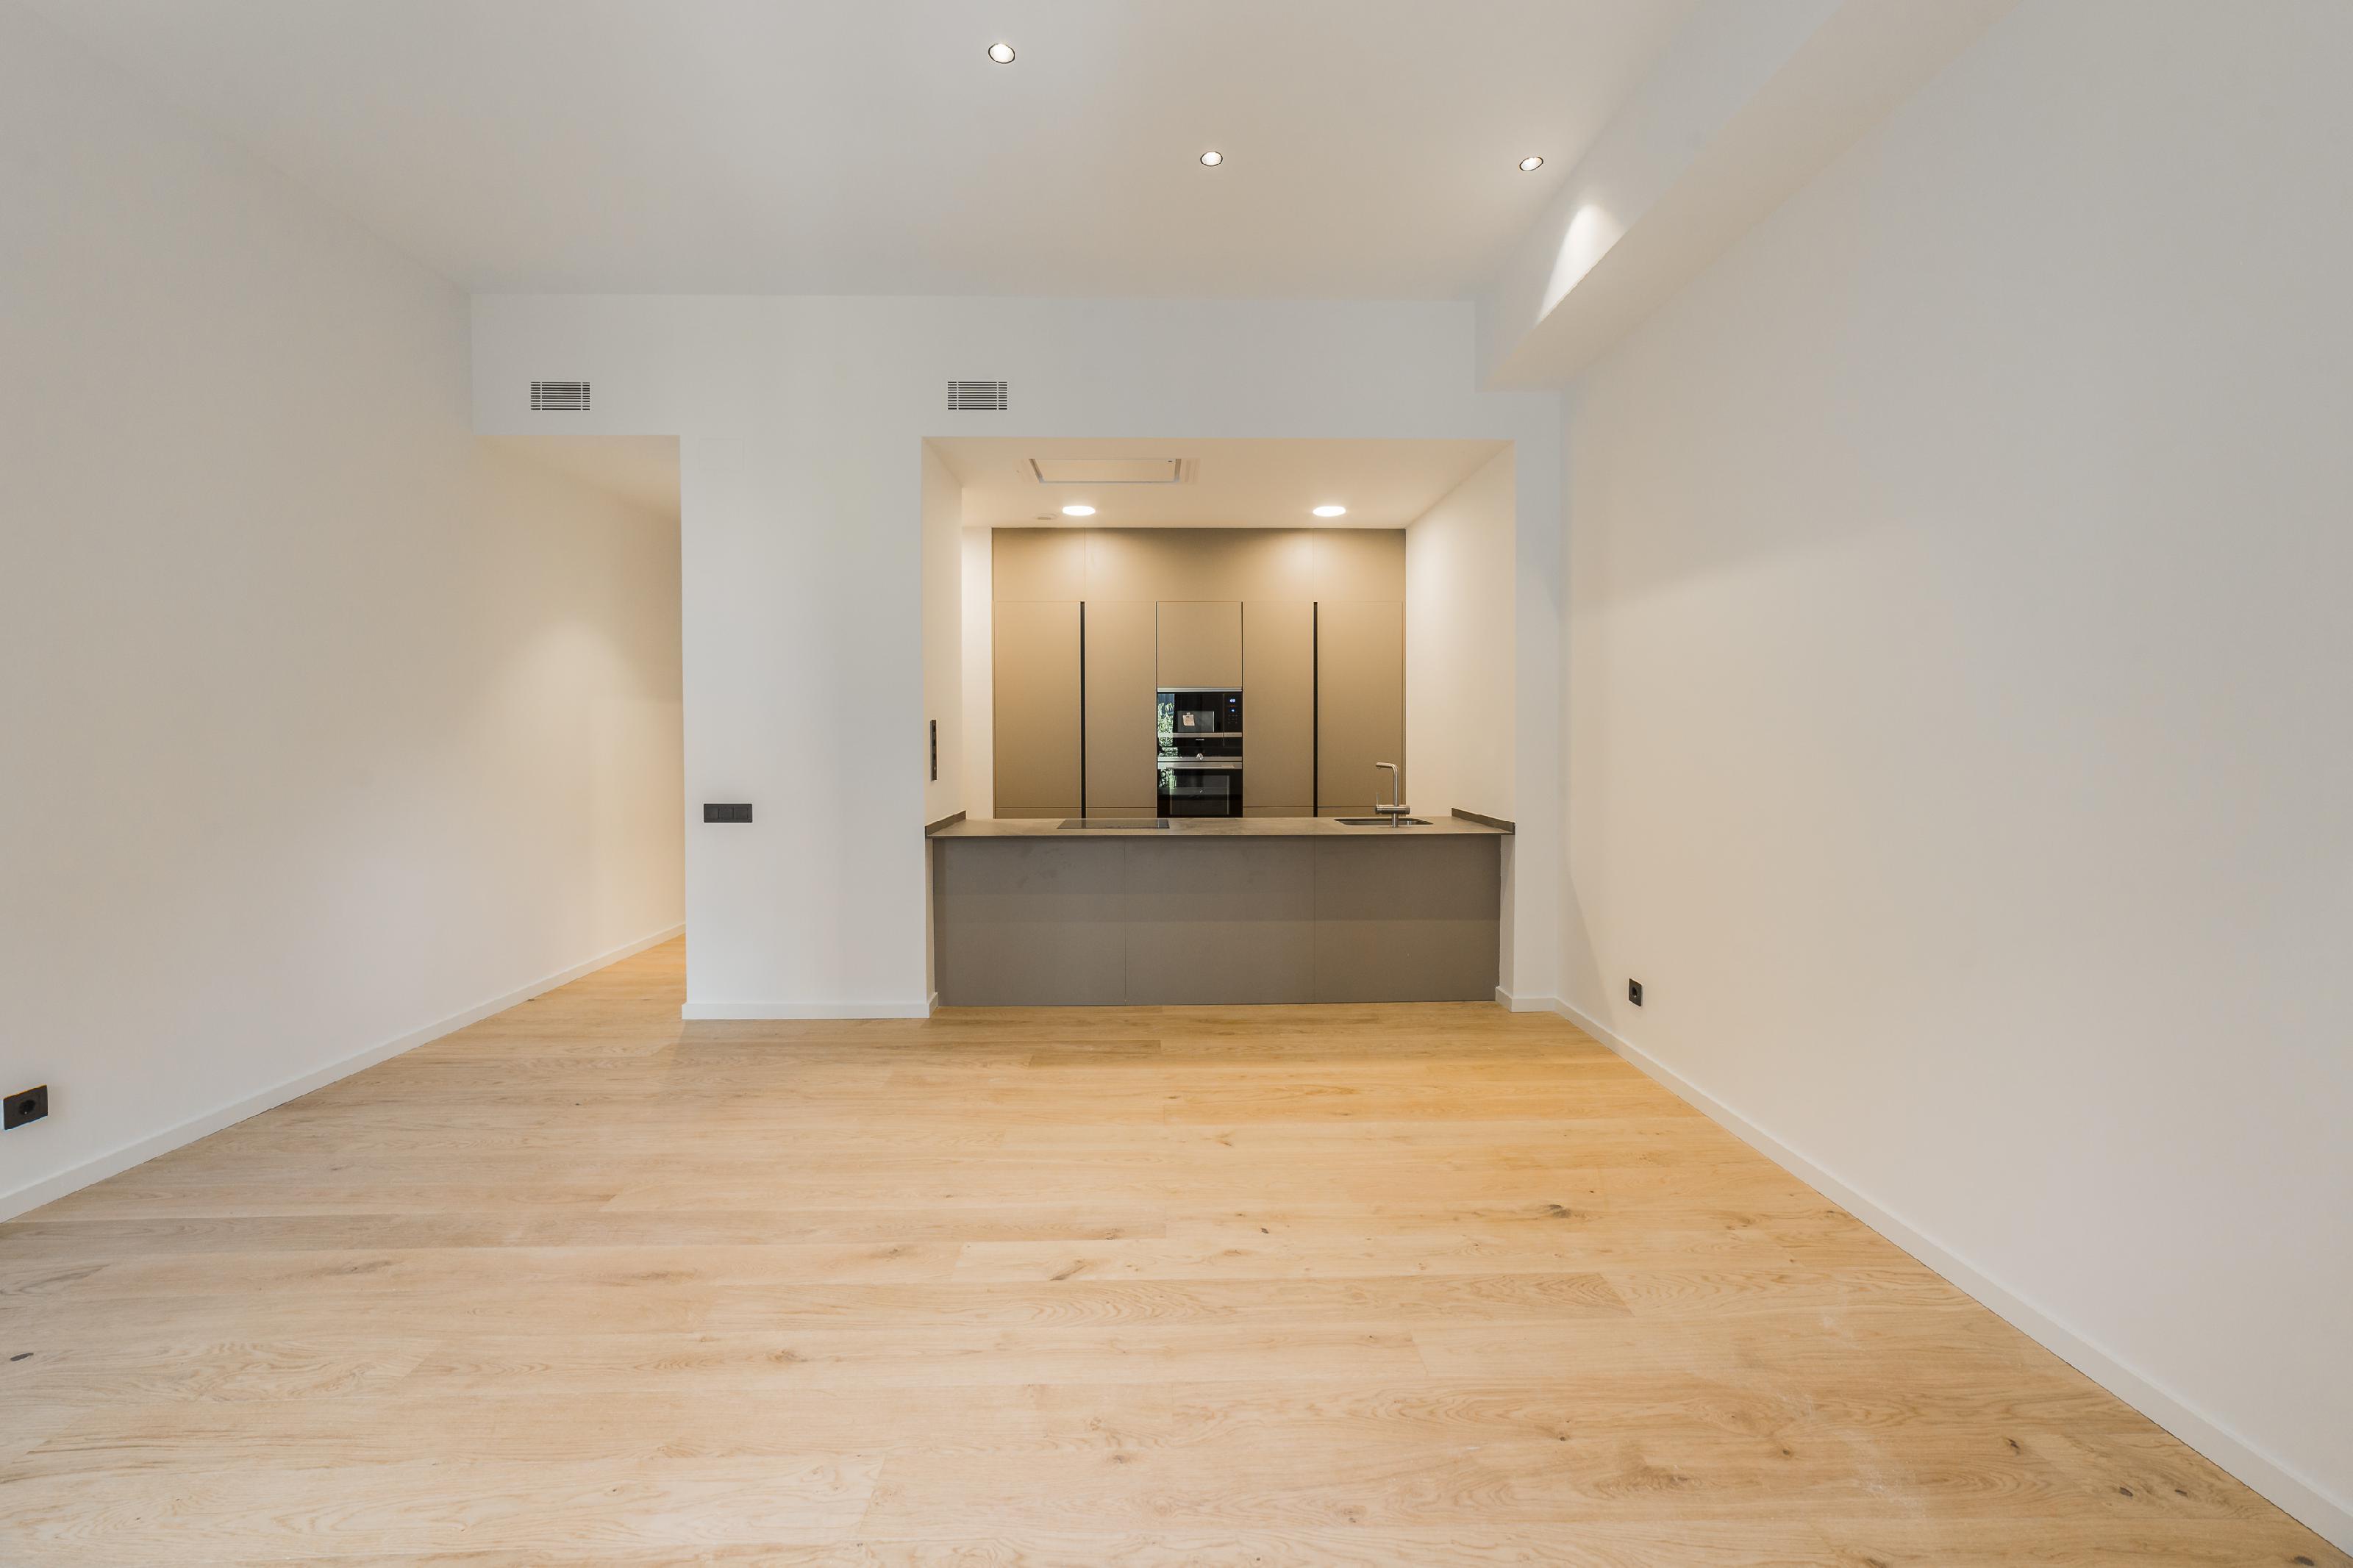 182456 Apartamento en venda en Eixample, Antiga Esquerre Eixample 10